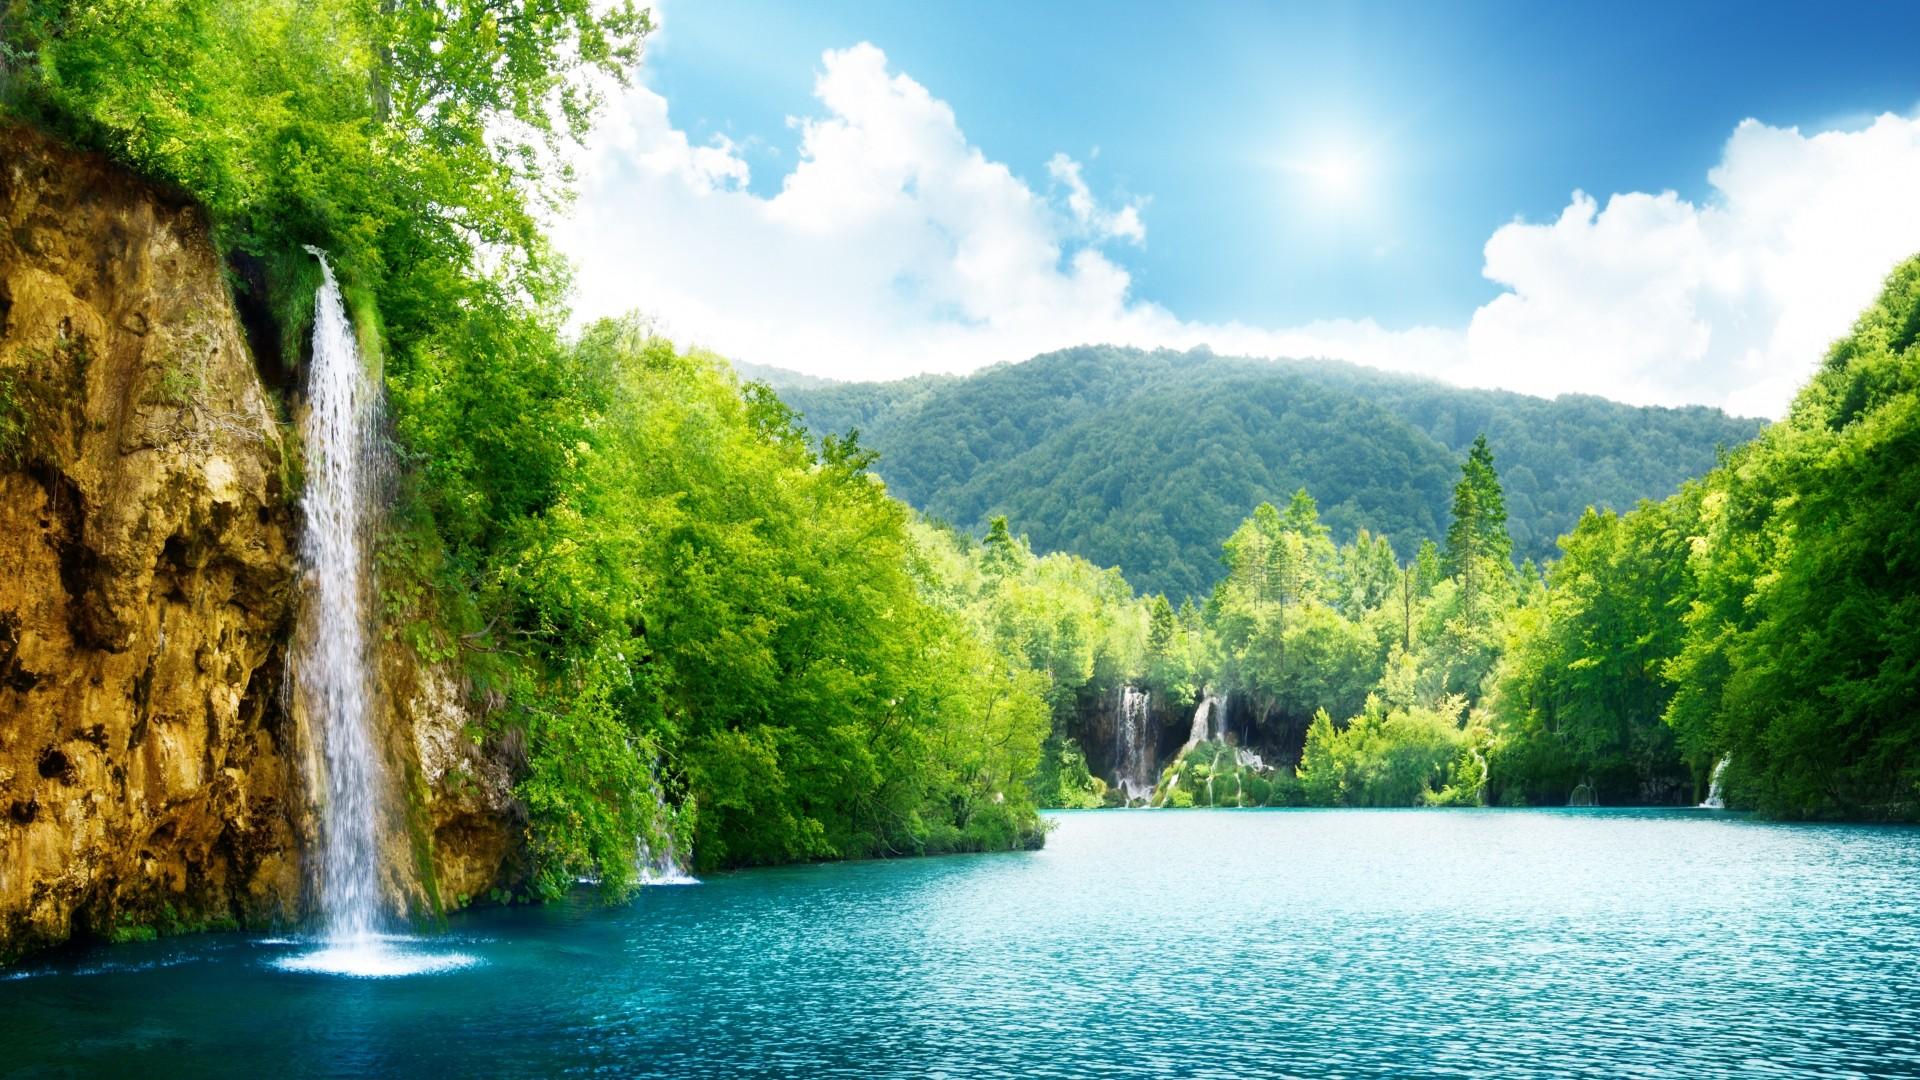 Nature HD Wallpapers 1080p | WallpapersCharlie